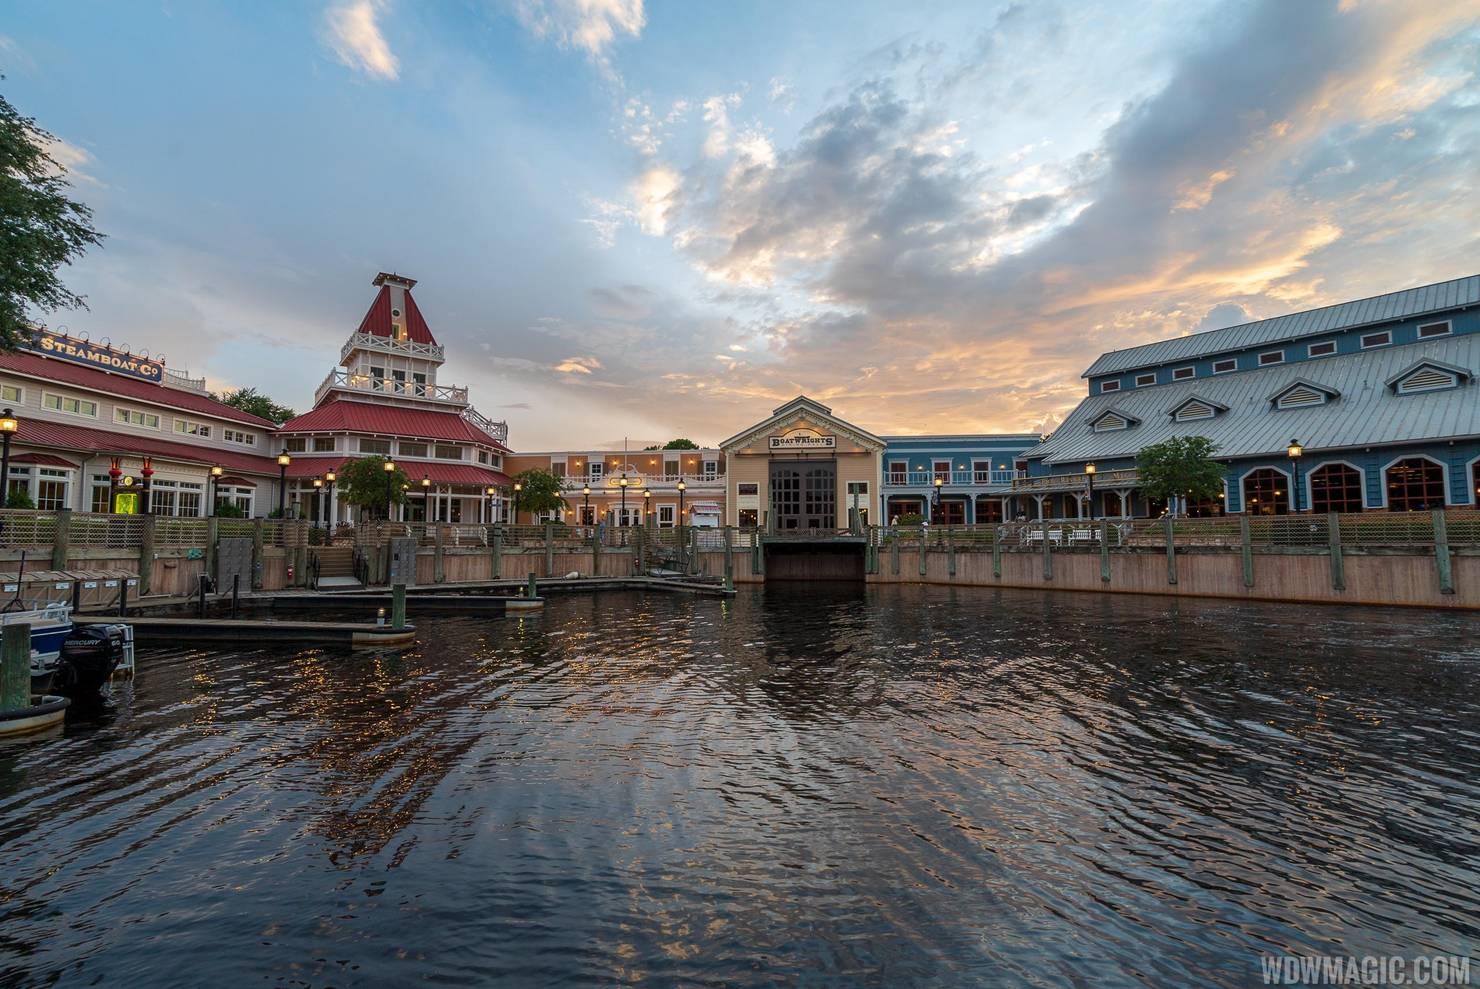 Disney's Port Orleans Riverside will reopen October 14 2021